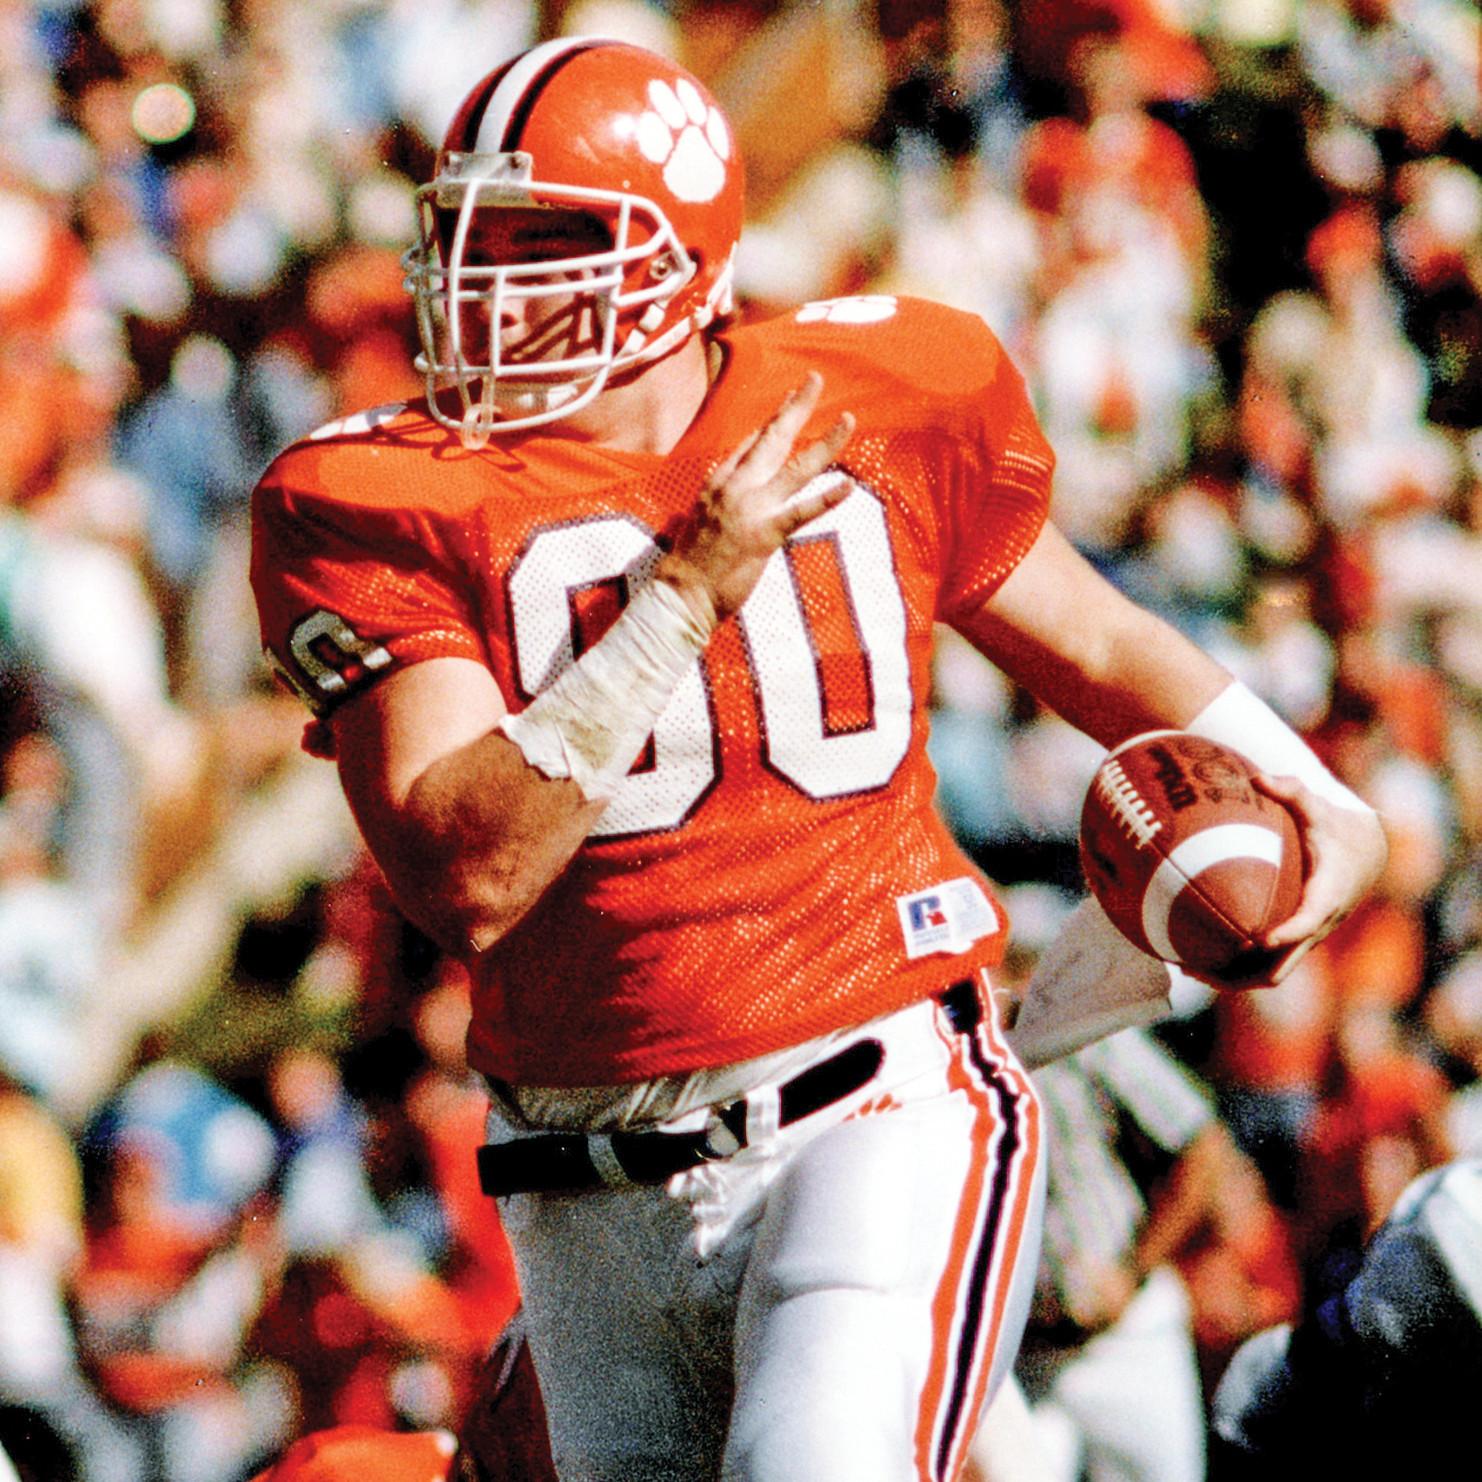 1990 Tigers – 25th Anniversary